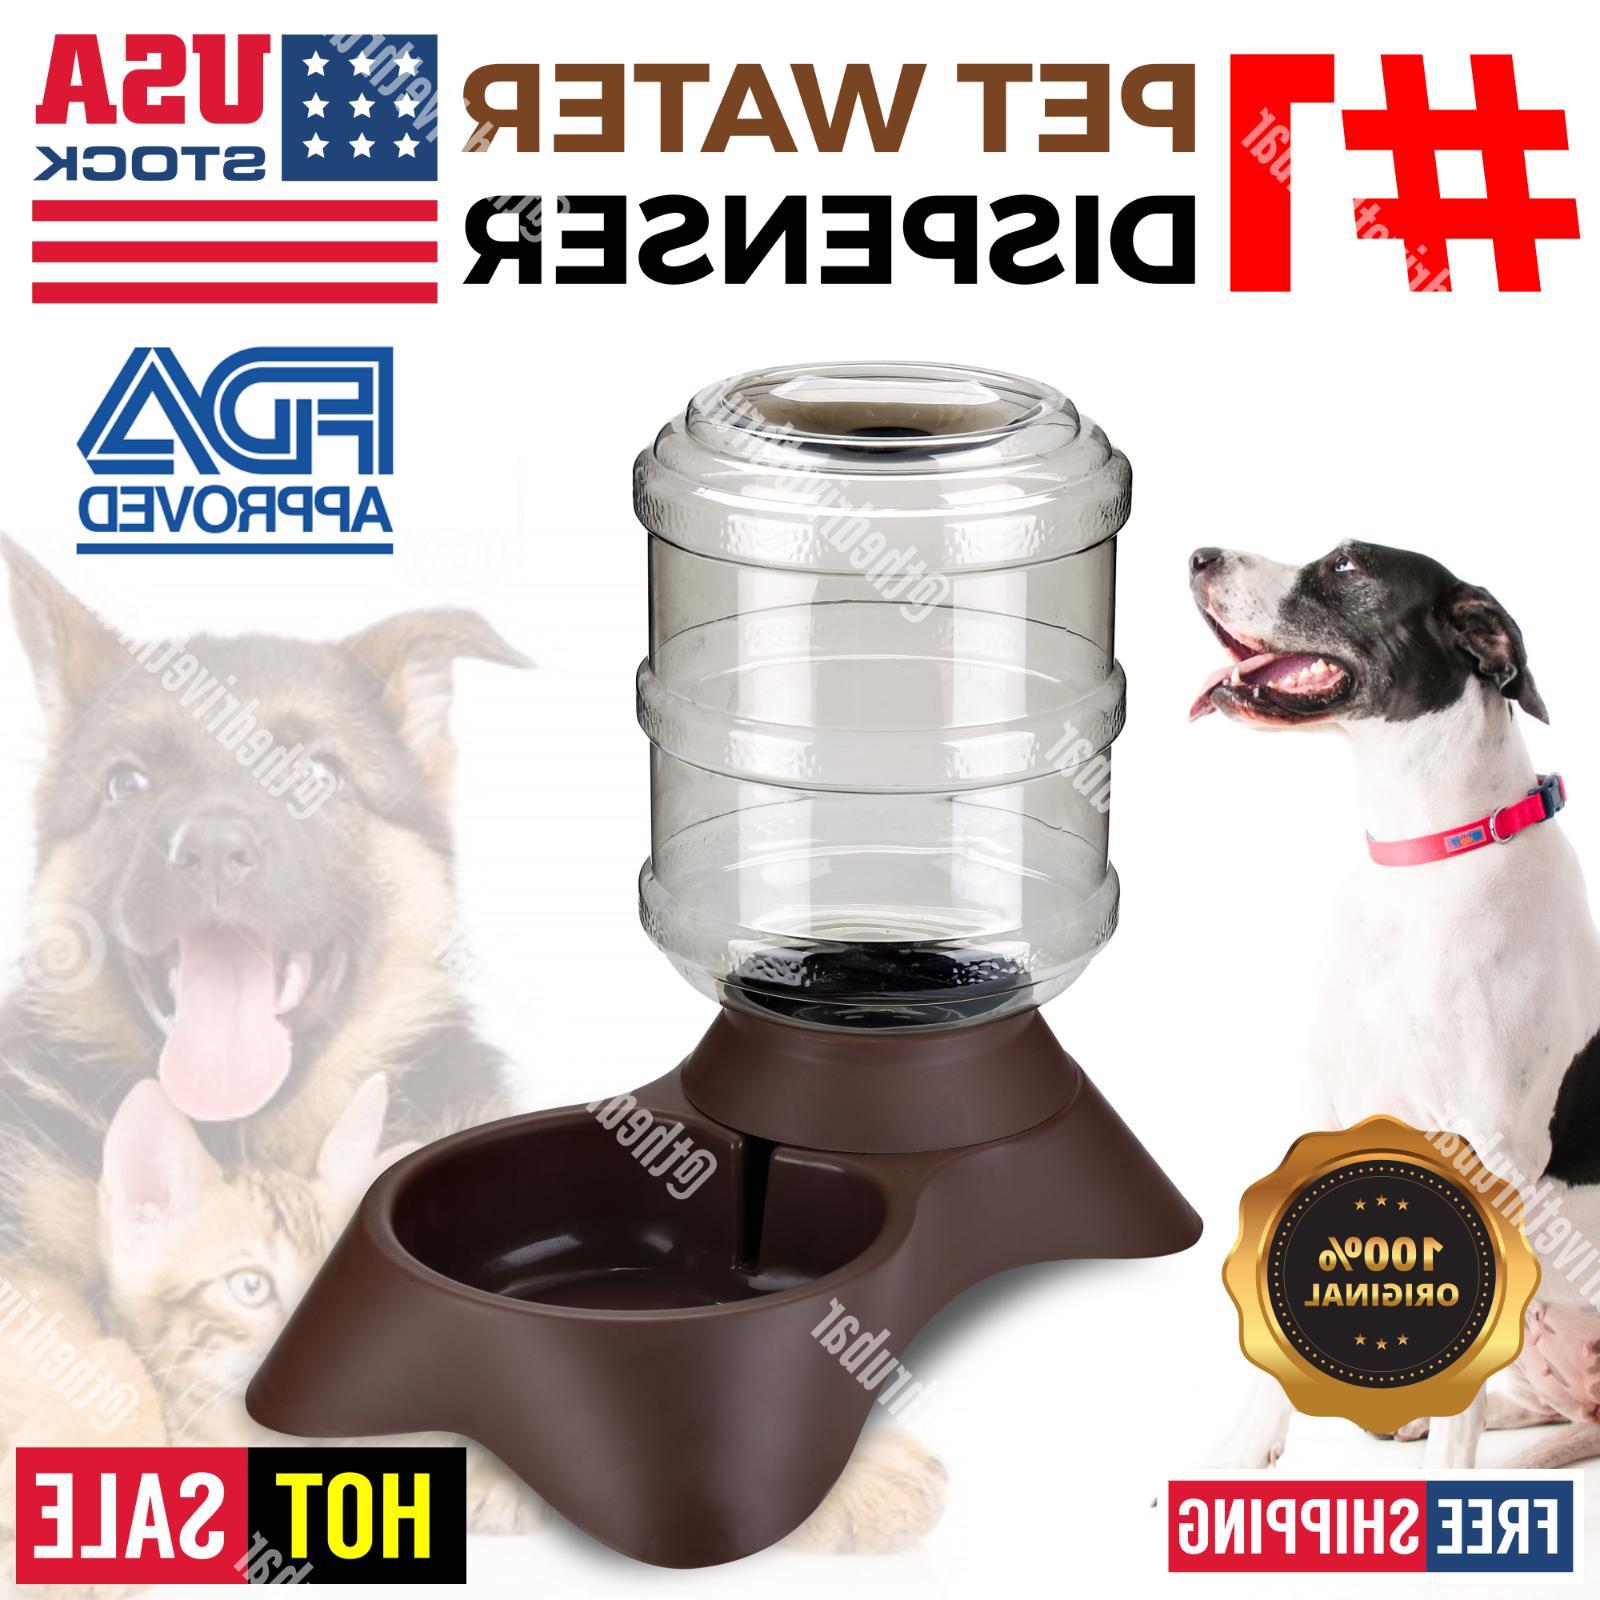 AUTOMATIC PET Feeder Puppy Feeding Bowl Cat